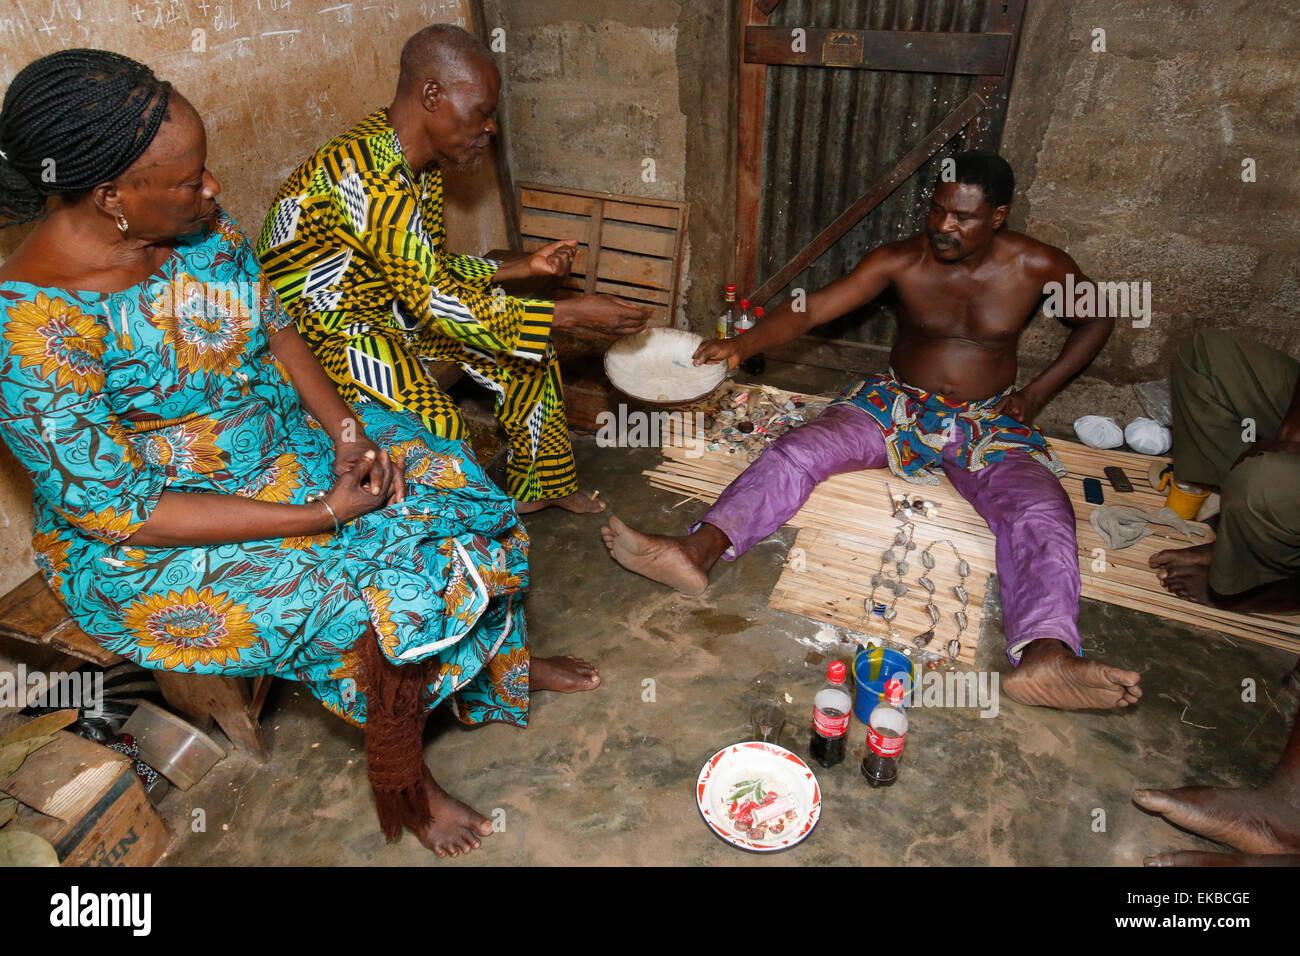 Paar Besuch einer Wahrsagerin in Ouidah, Benin, Westafrika, Afrika Stockbild